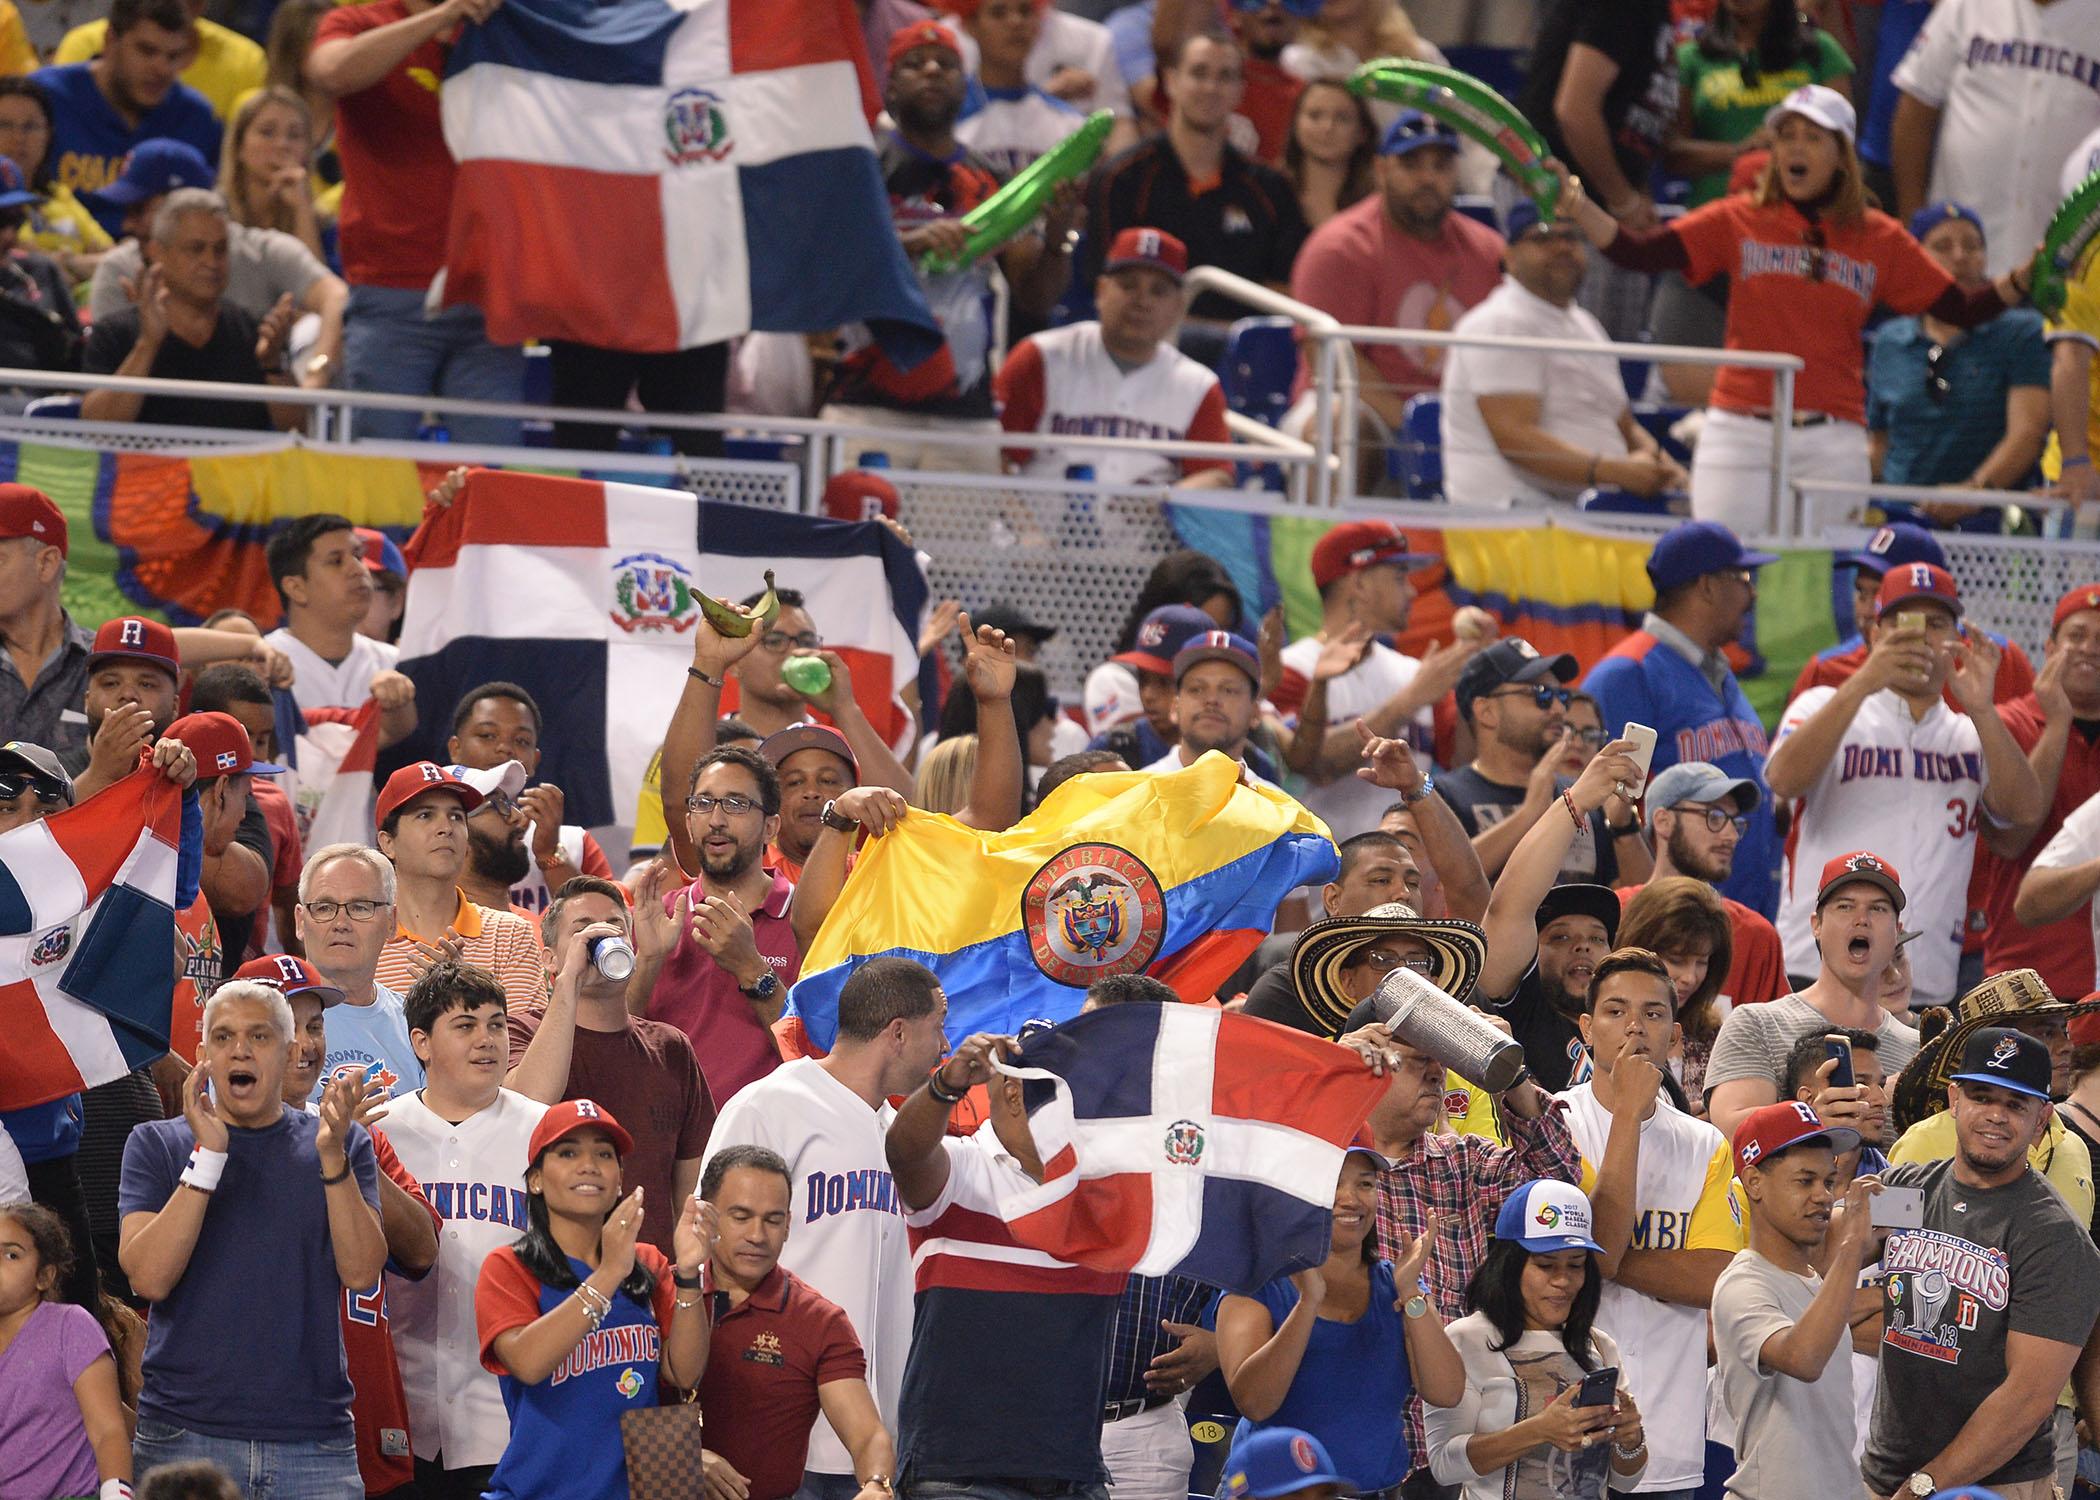 BASEBALL: MAR 12 World Baseball Classic 1st Round Pool C - Dominican Rep. v Colombia